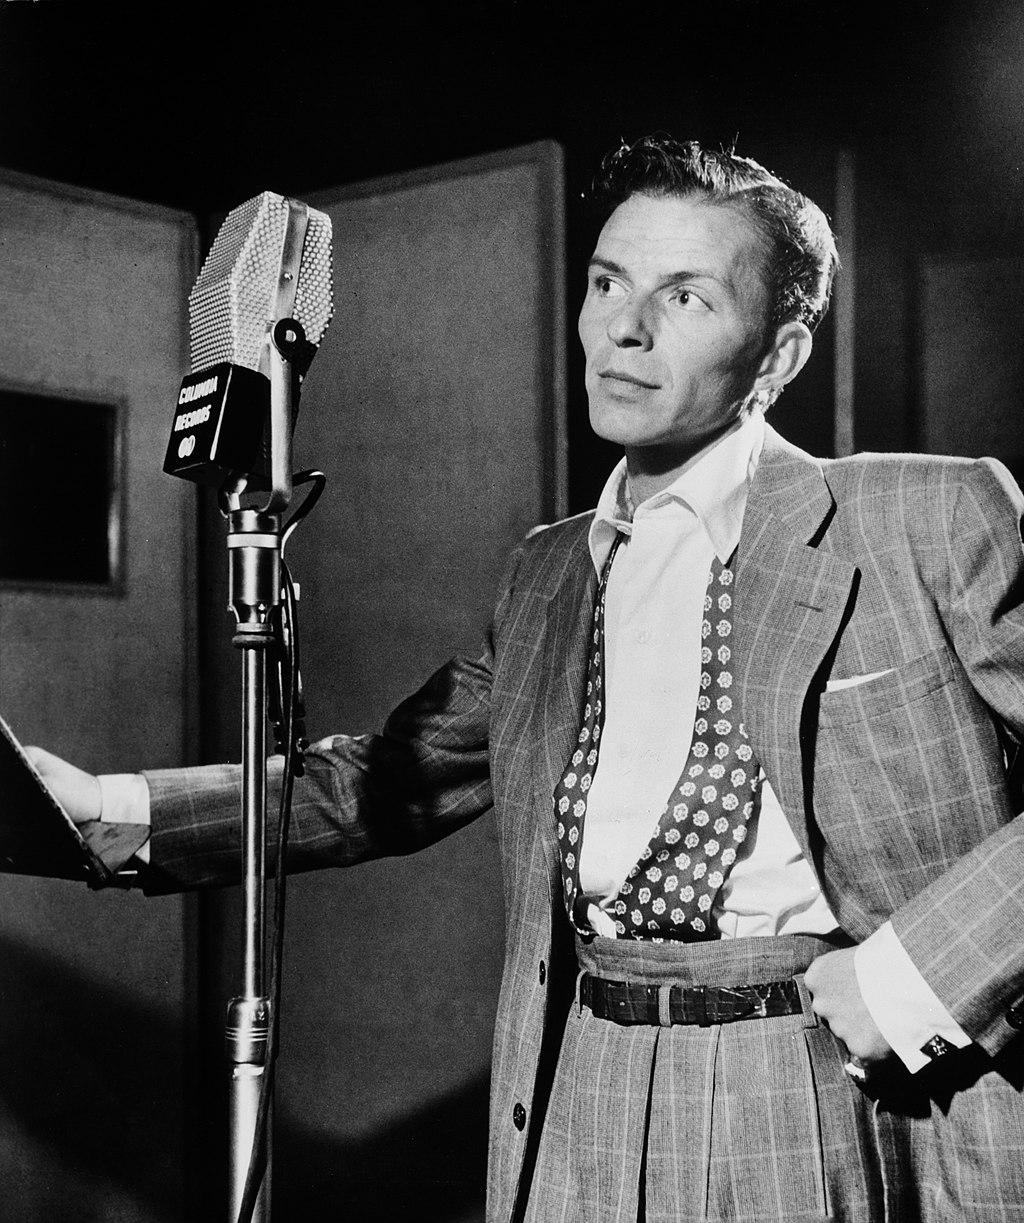 Portrait of Frank Sinatra in Liederkranz Hall, Dominick the Donkey for Christmas - The Proud Italian